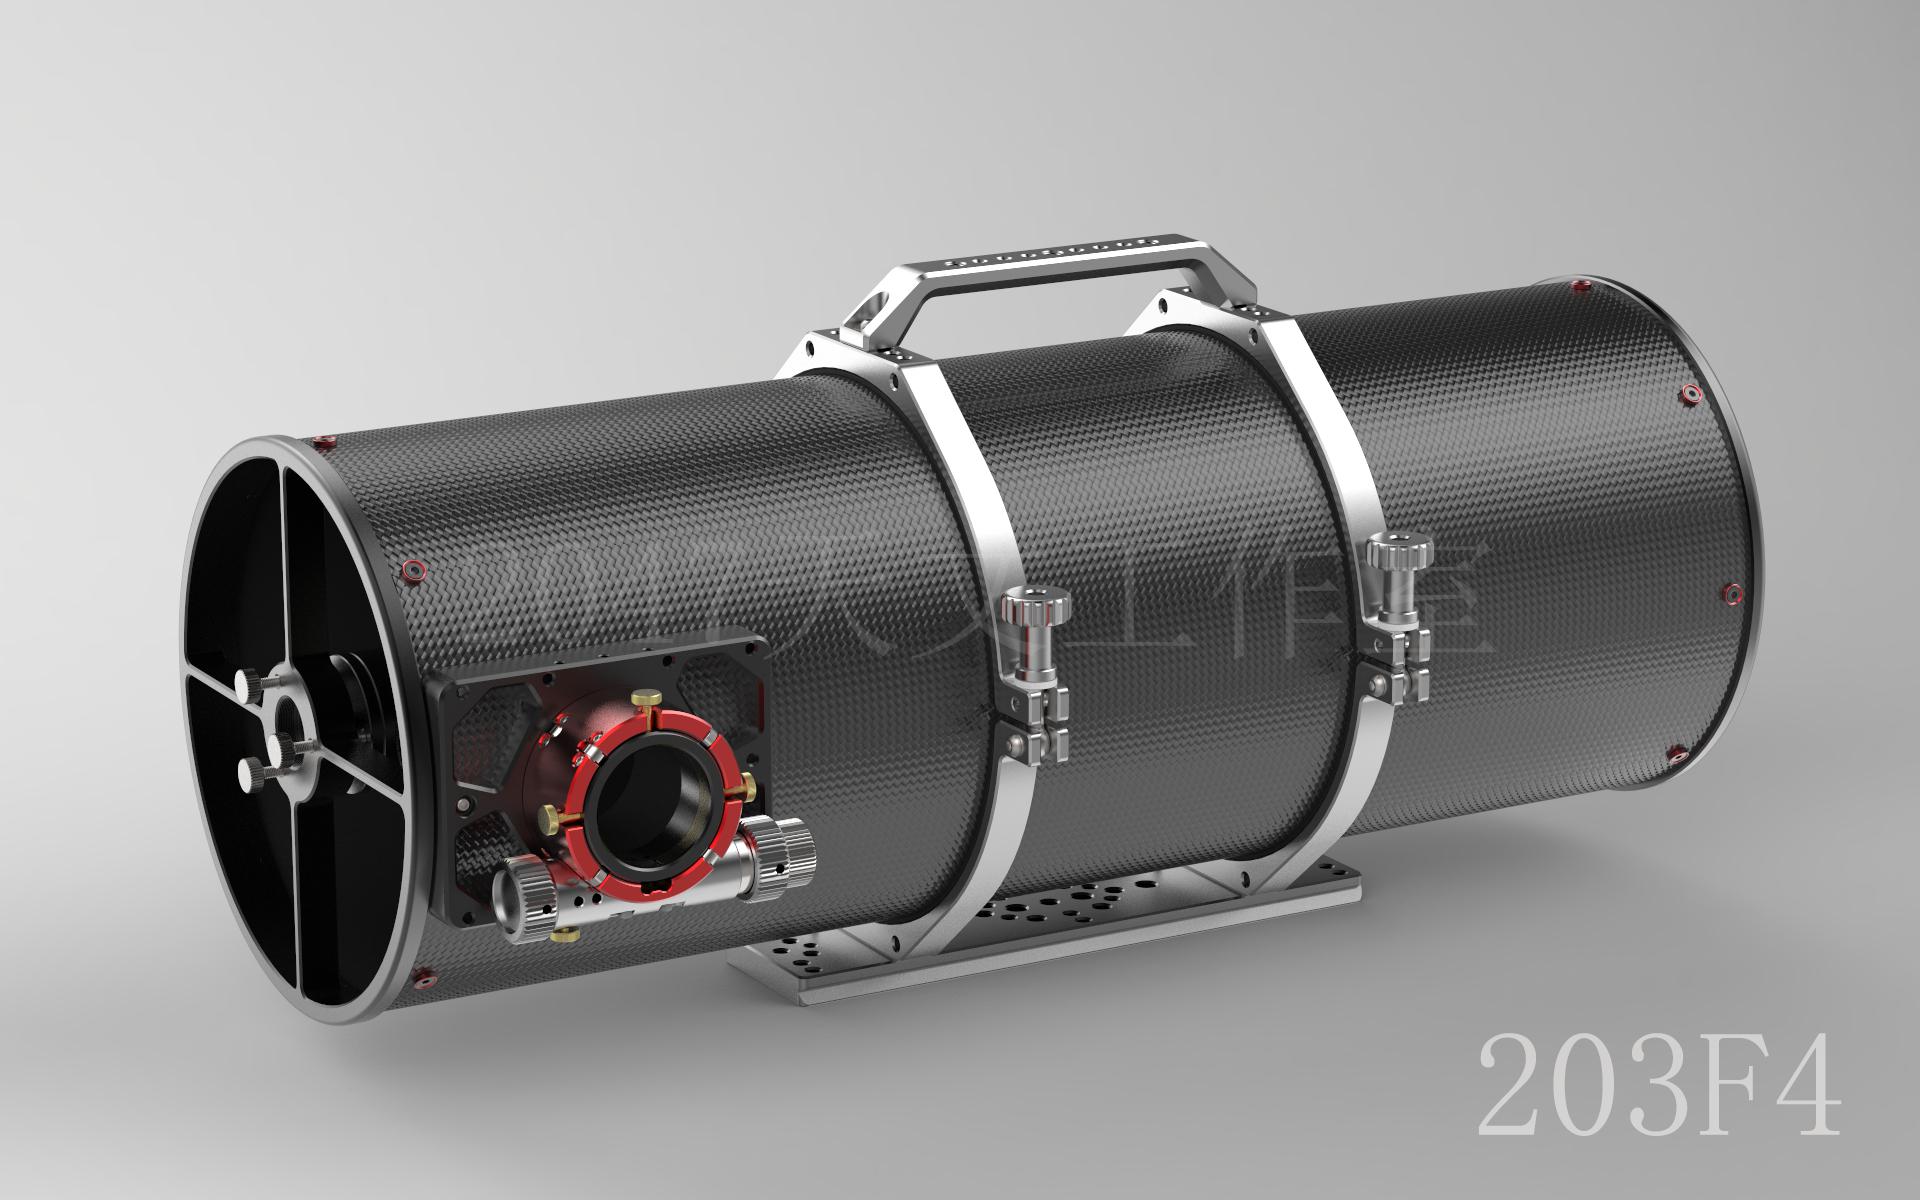 20200221-203碳筒牛反-01.png